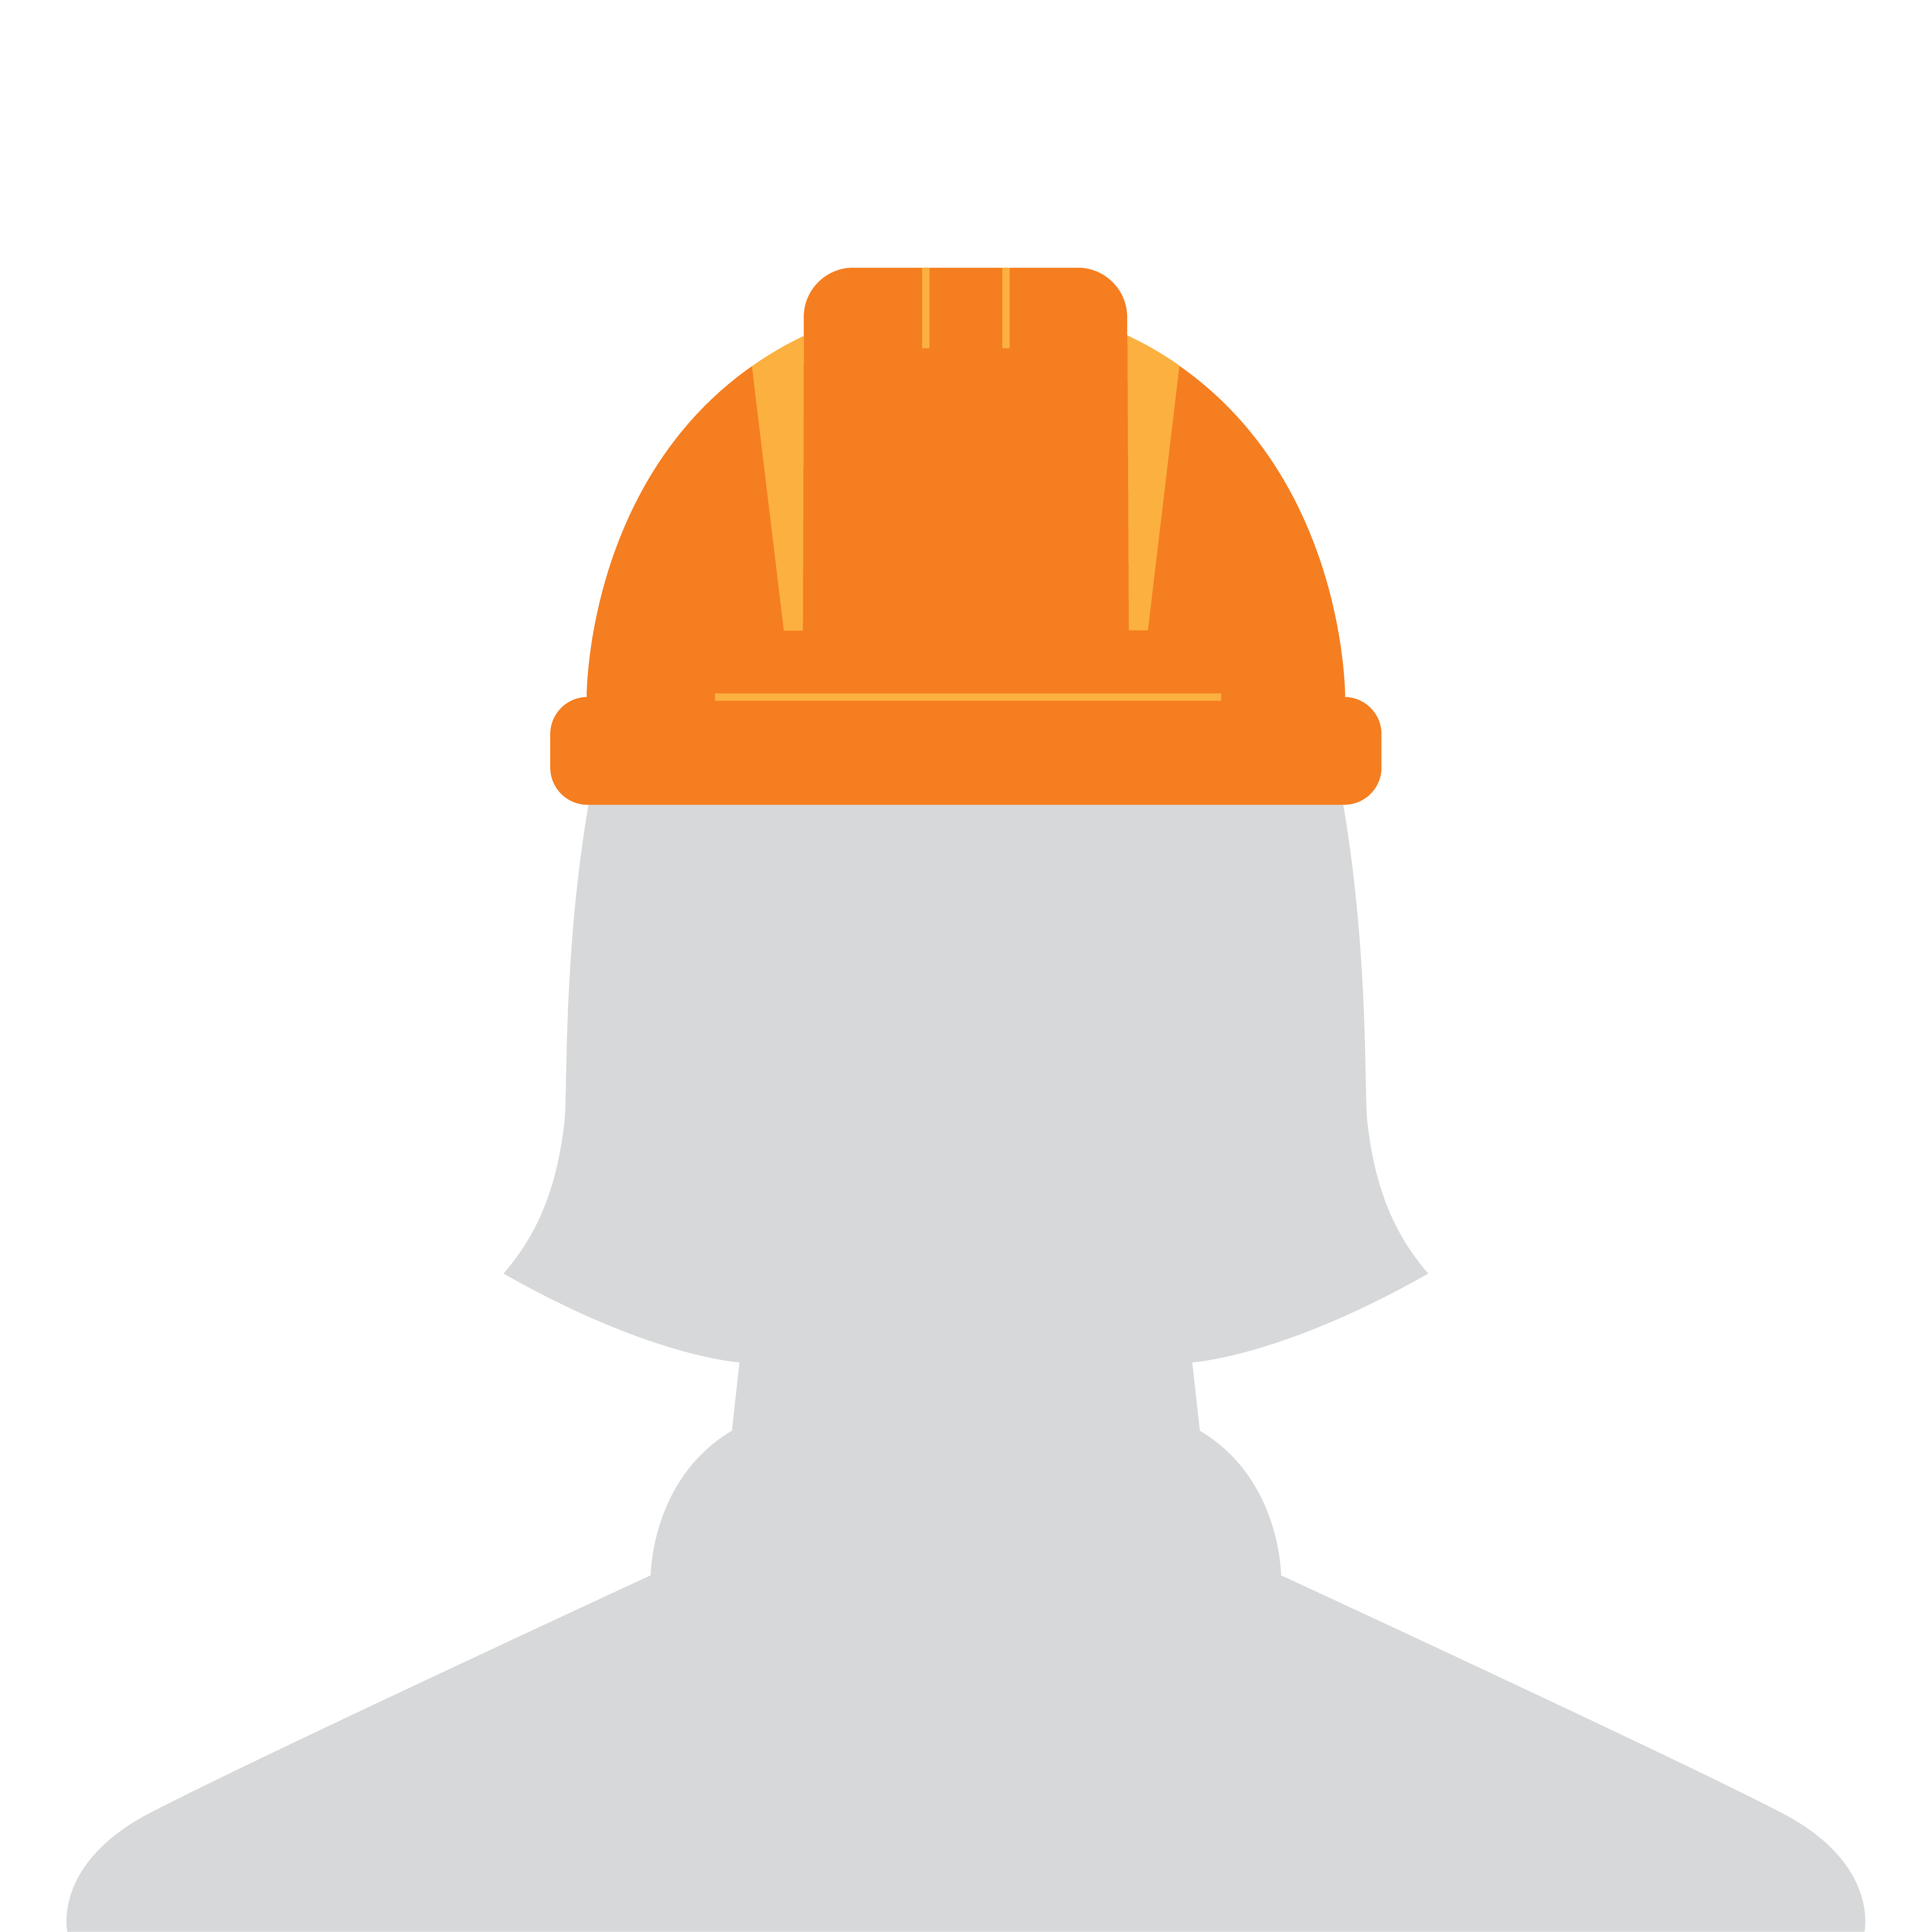 Employee Placeholder - Female